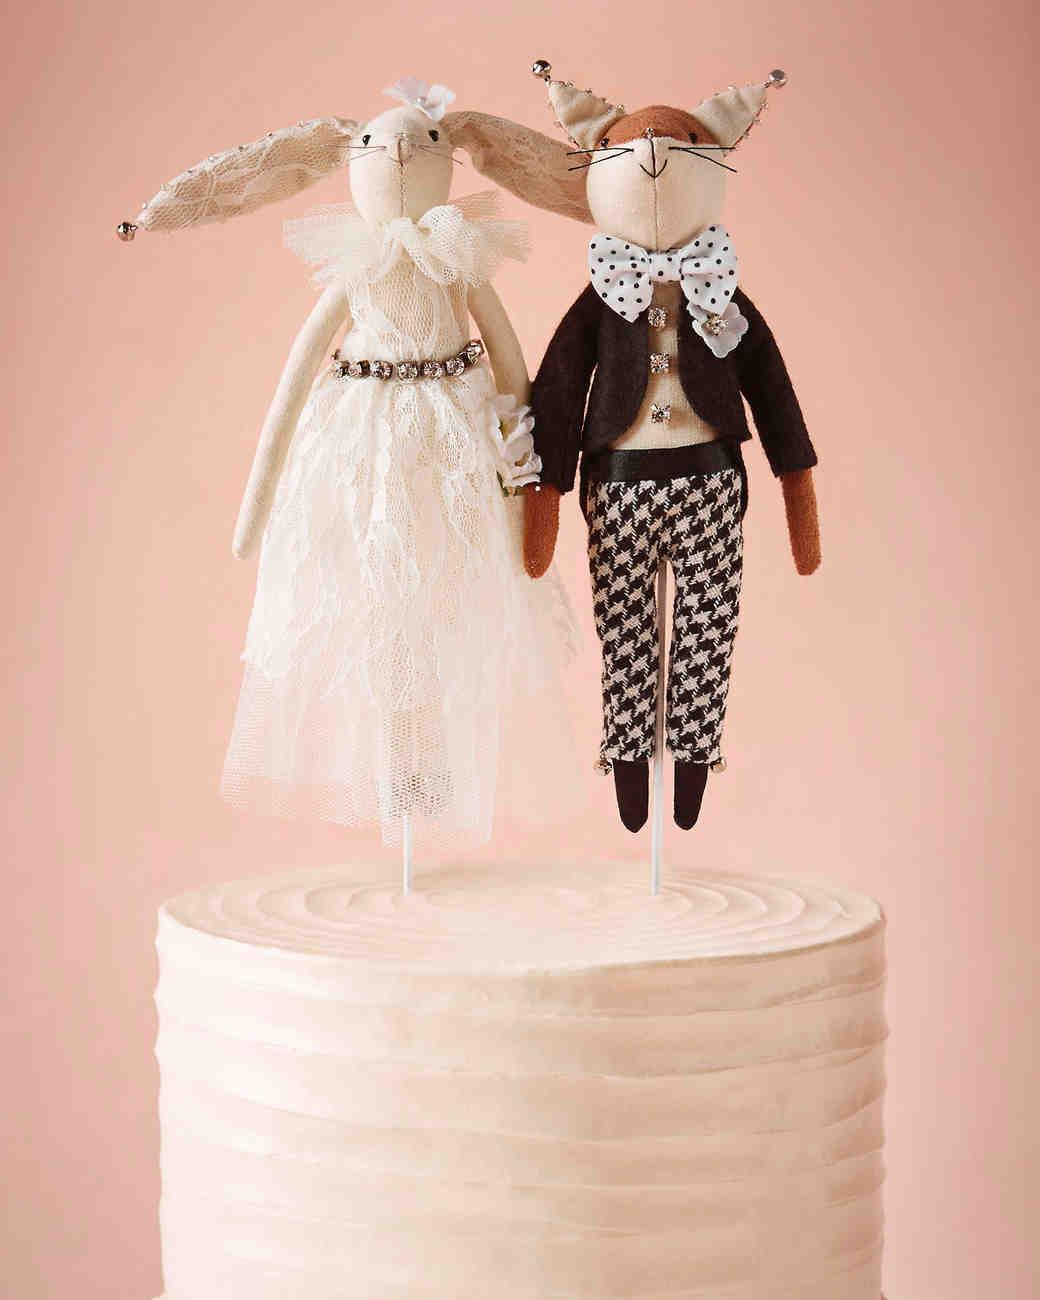 wedding-cake-toppers-stuffed-animals-1115.jpg